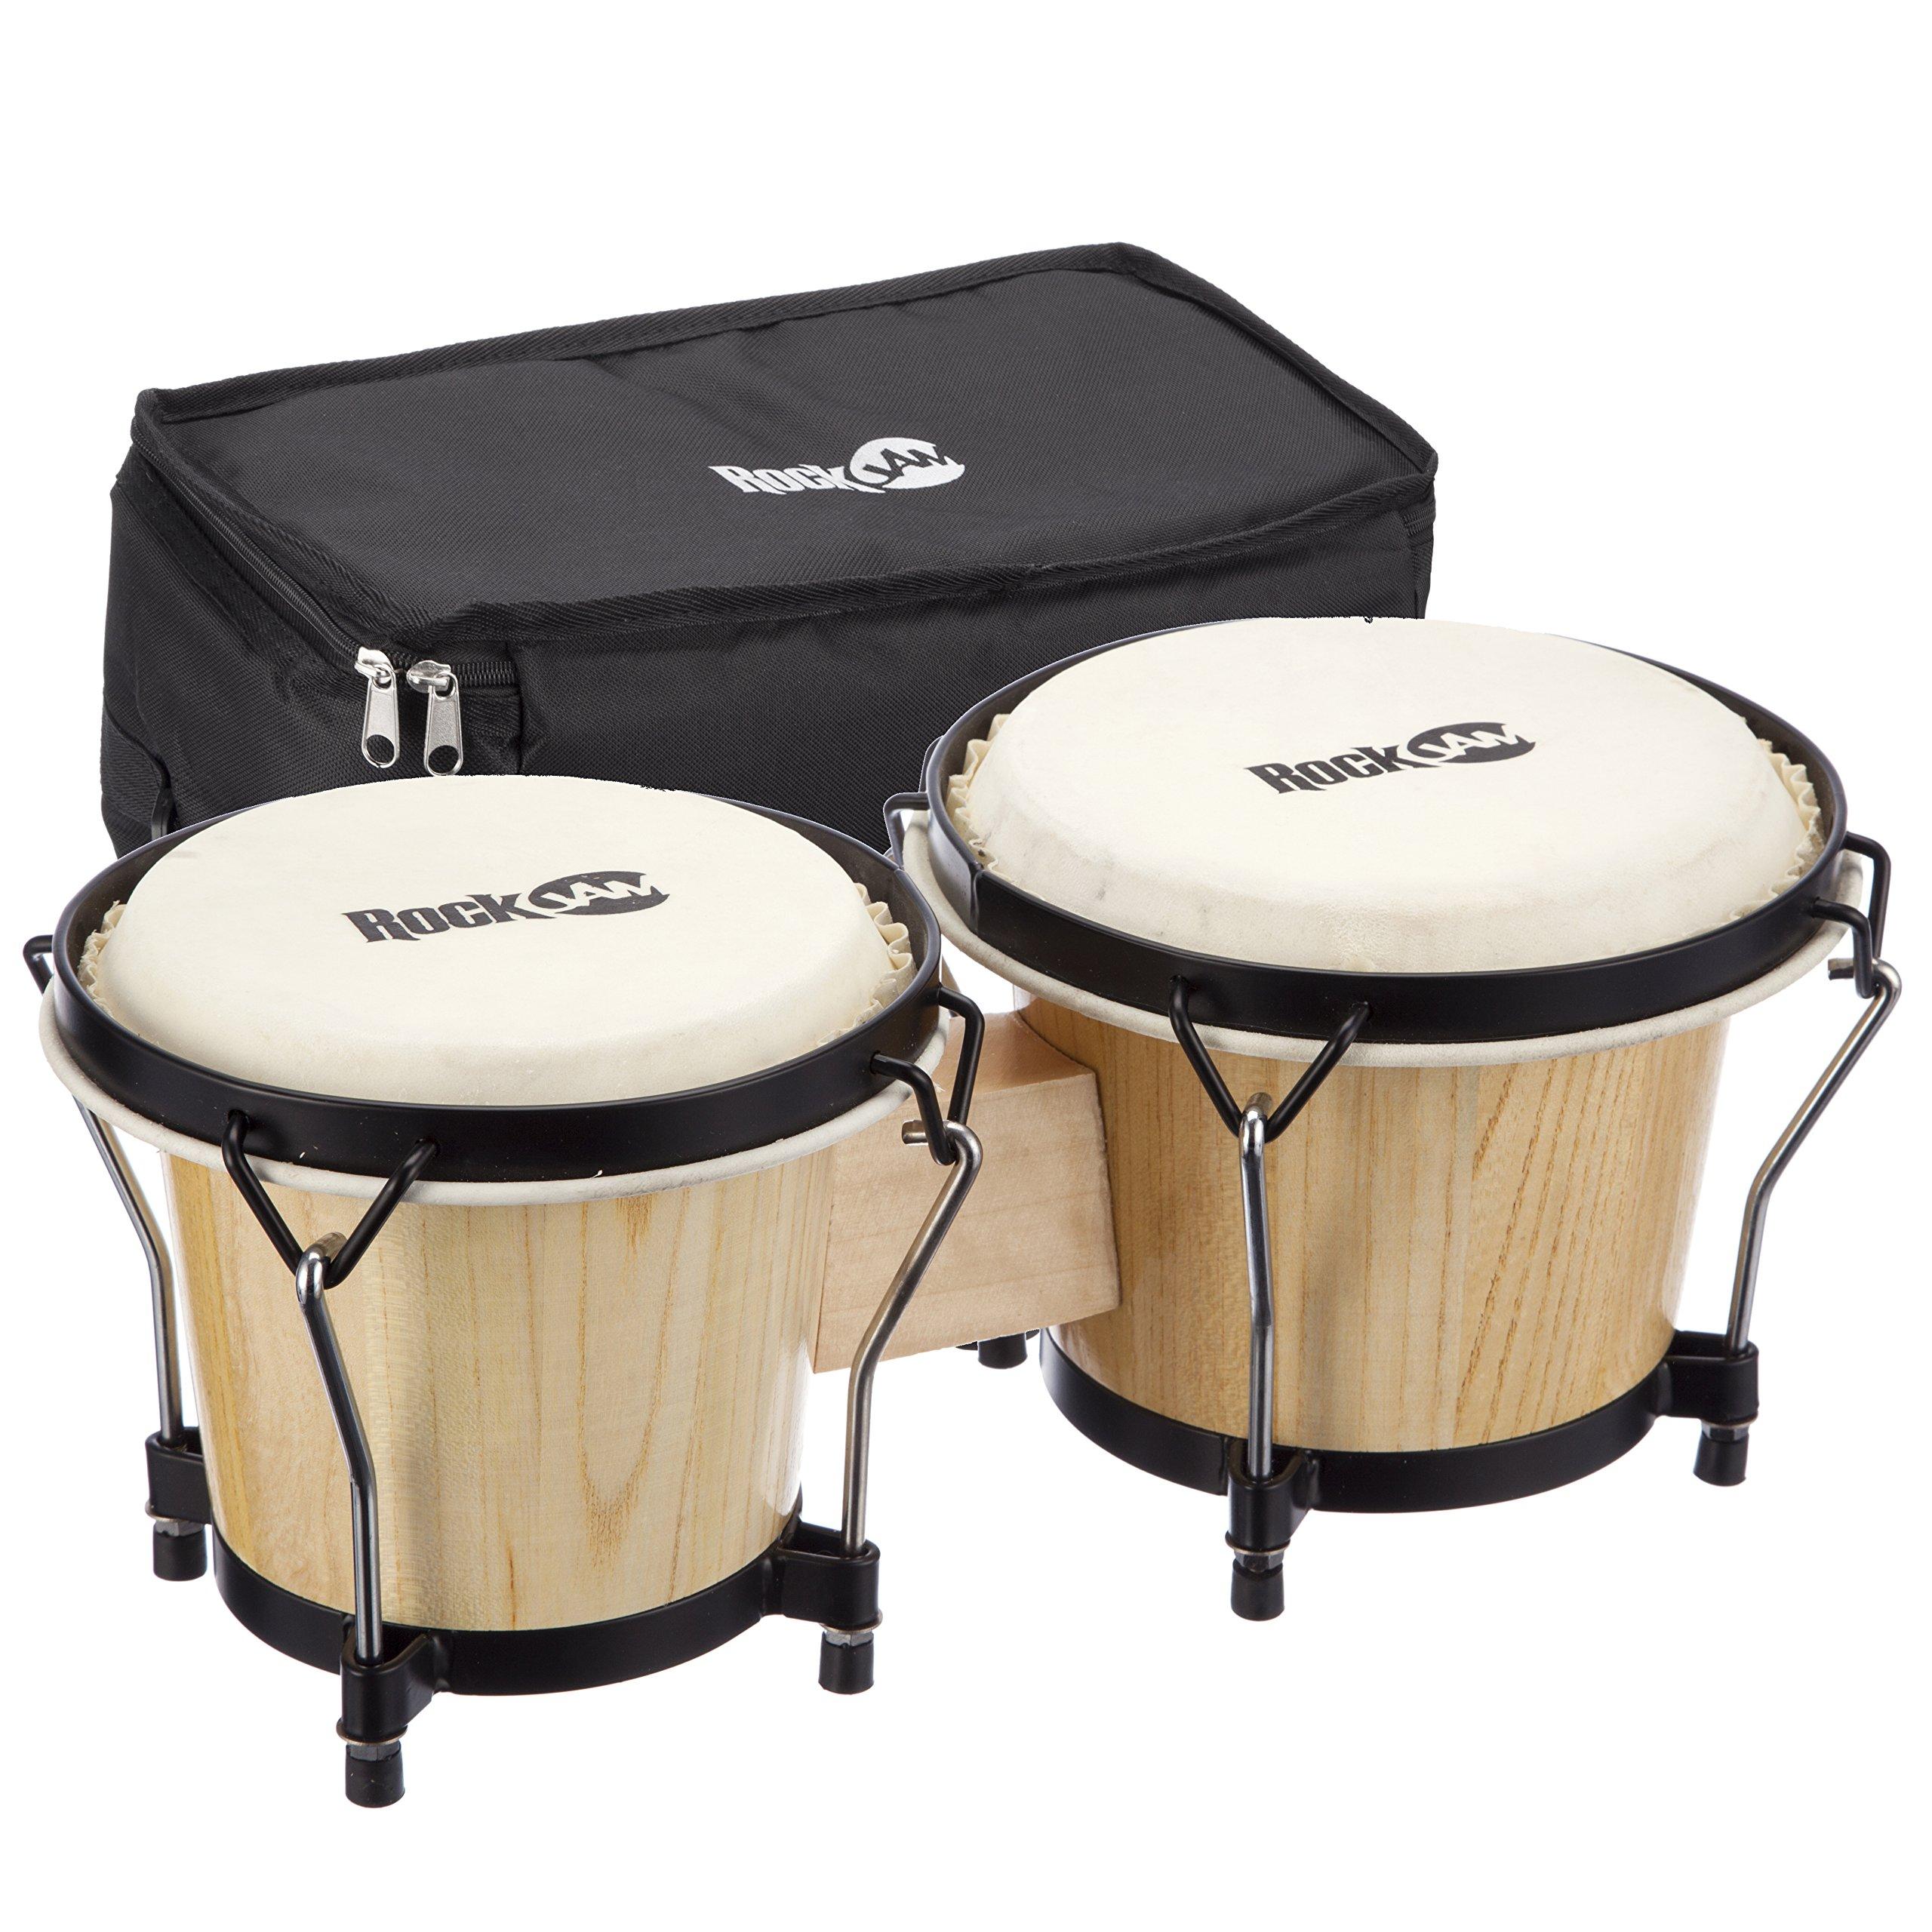 RockJam 100300 7'' & 8'' Bongo Drum Set with Padded Bag, Natural